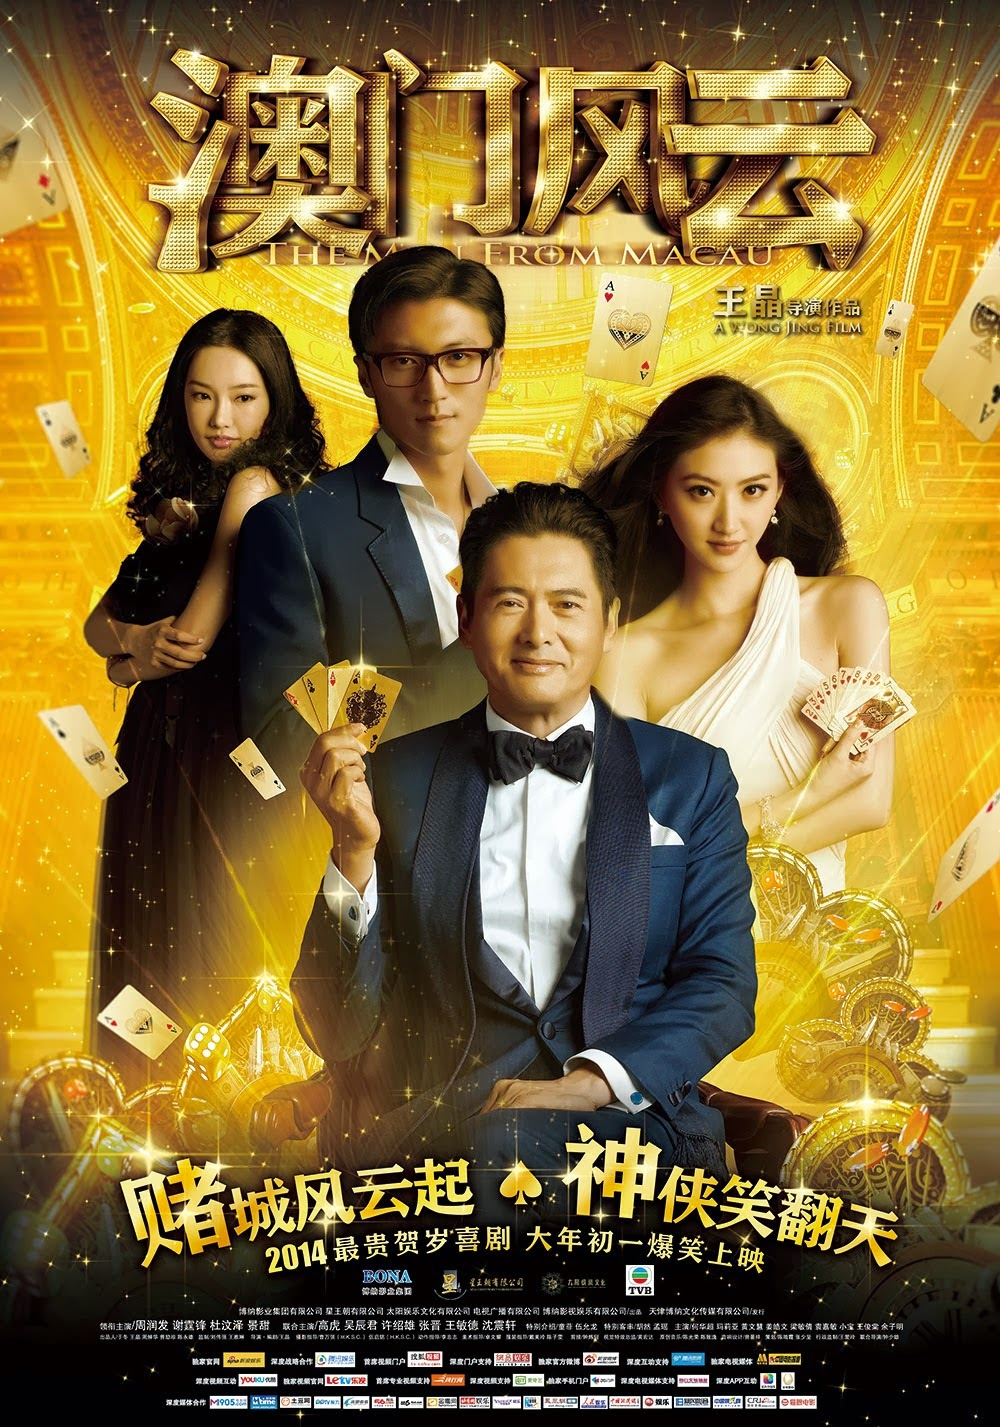 The Man from Macau (2014)